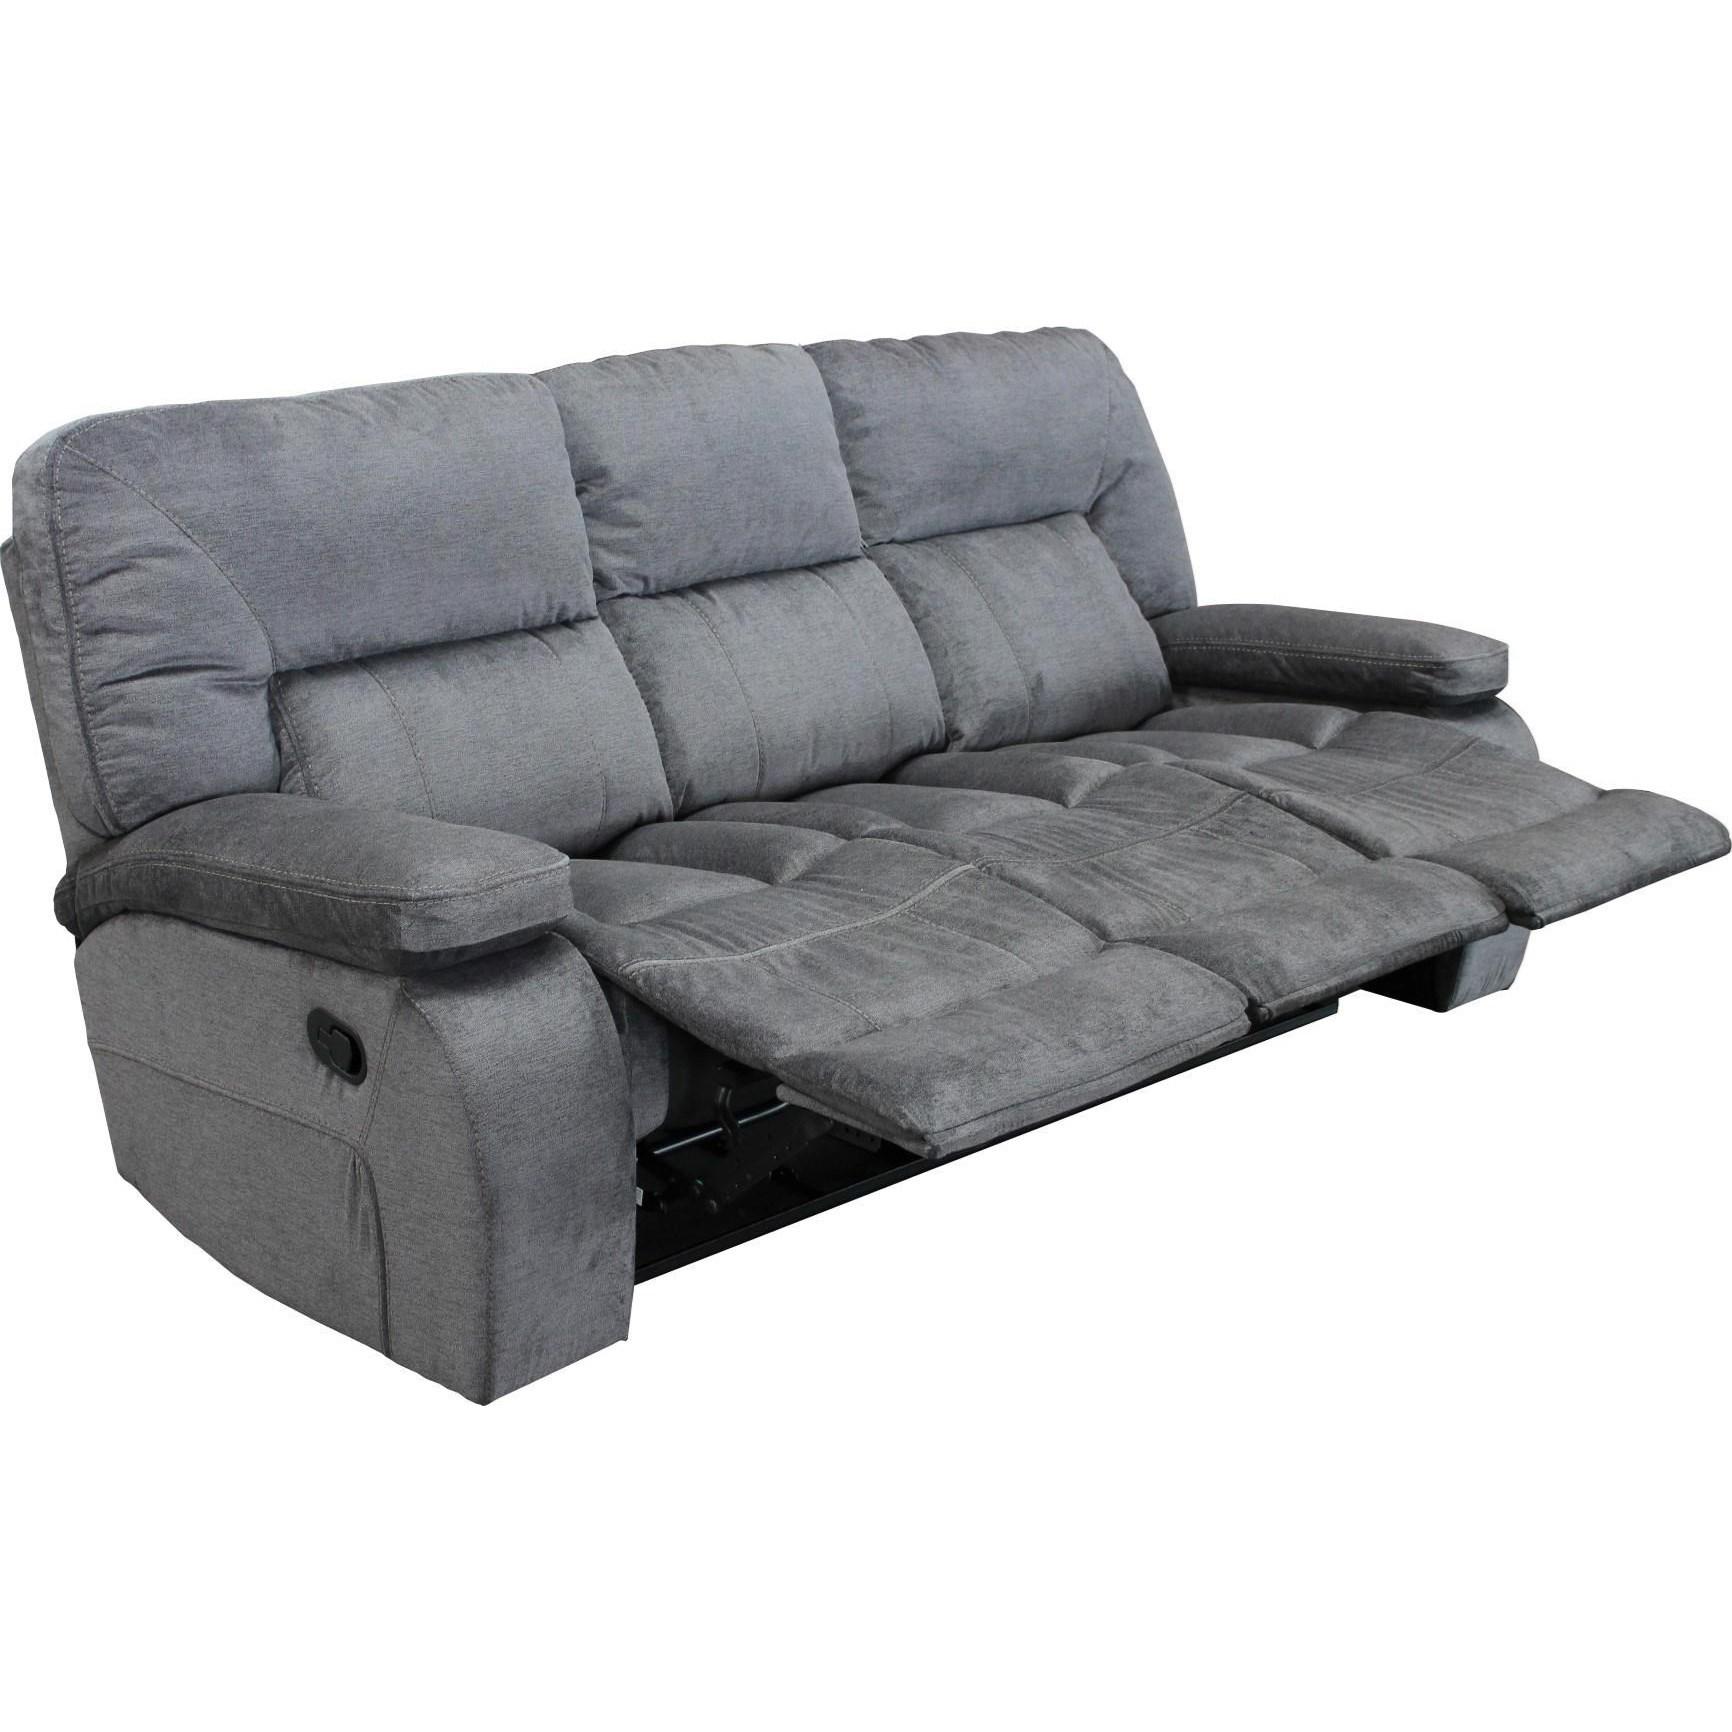 theo casual triple reclining sofa with pillow arms rotmans rh rotmans com triple recliner sofa cover triple reclining sofa fabric